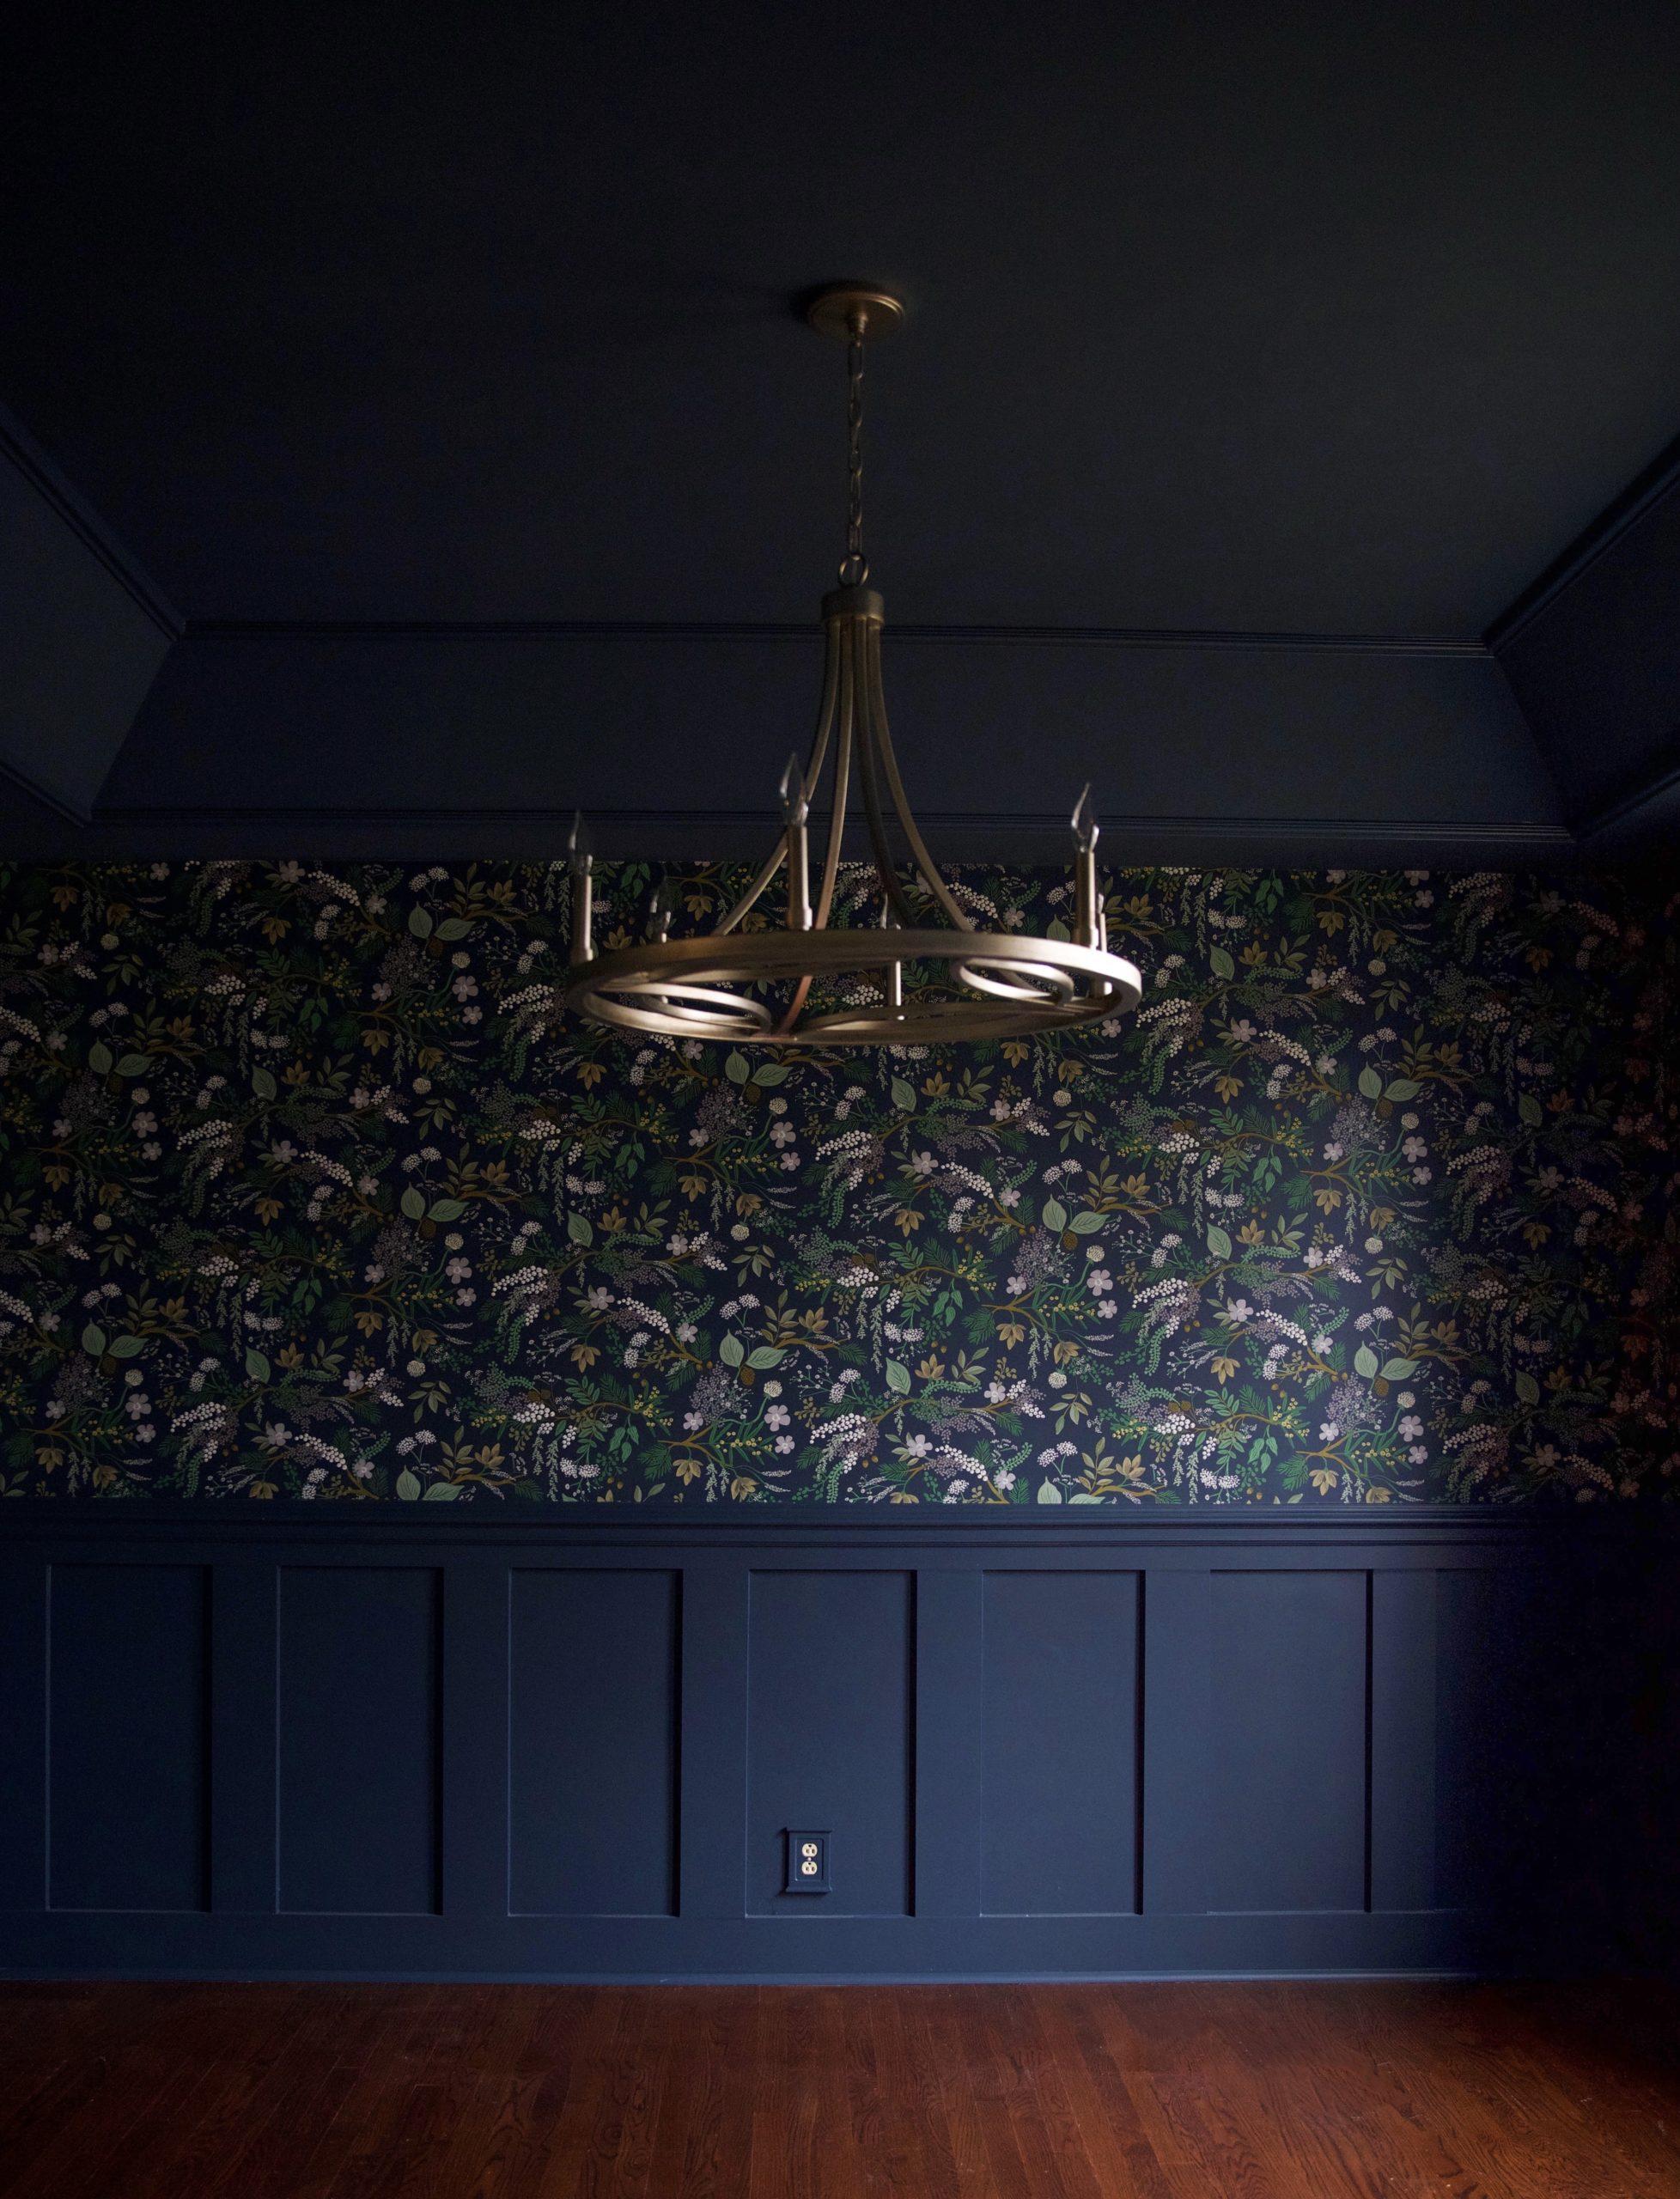 Dining room design - wallpaper - chandelier - lighting